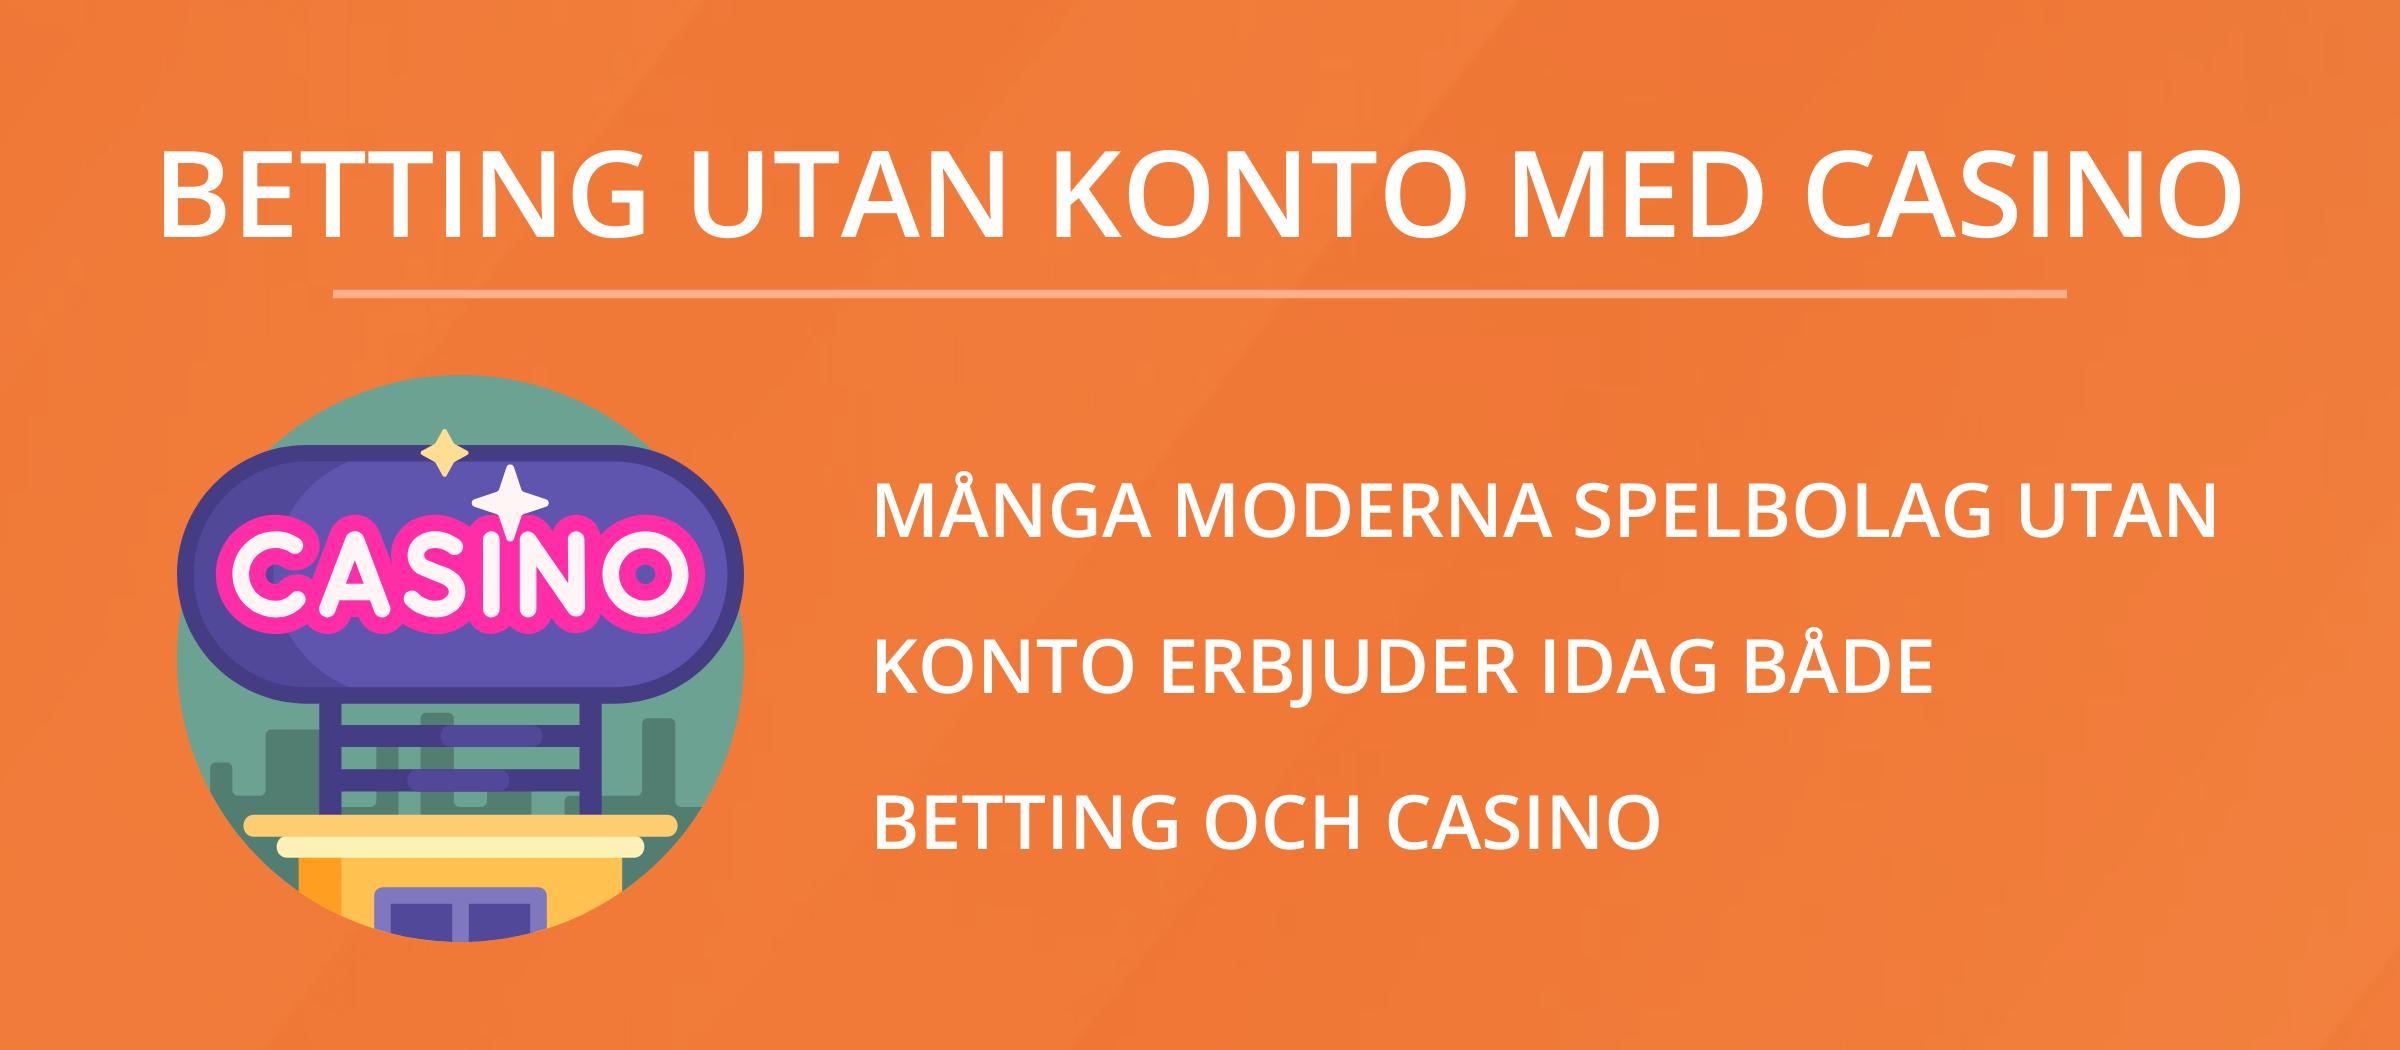 betting-utan-konto-med-casino-laktaren-1